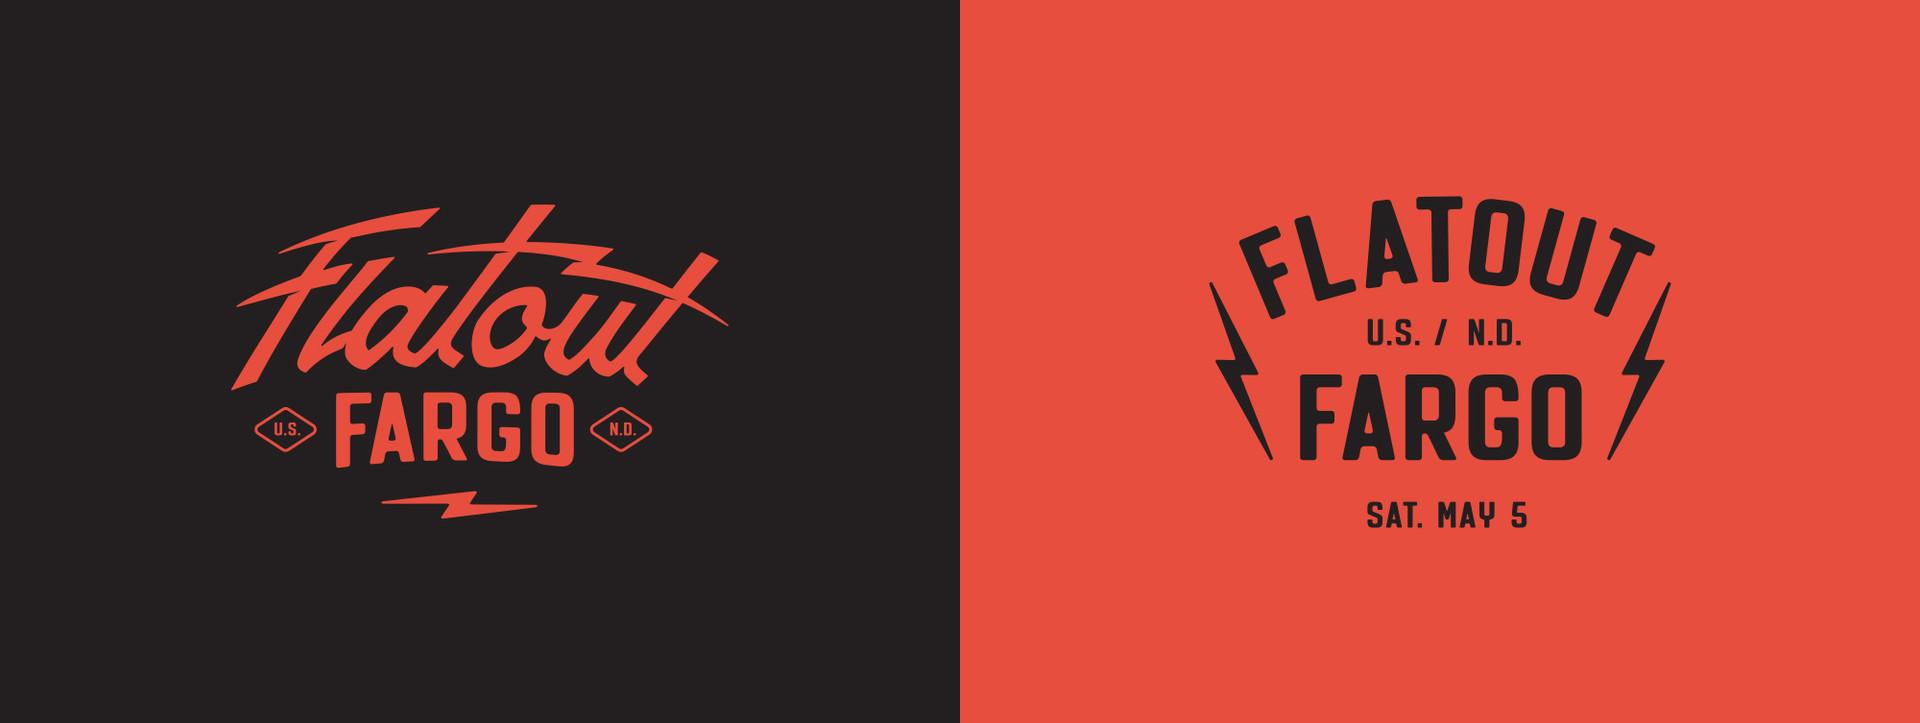 Flatout Logos